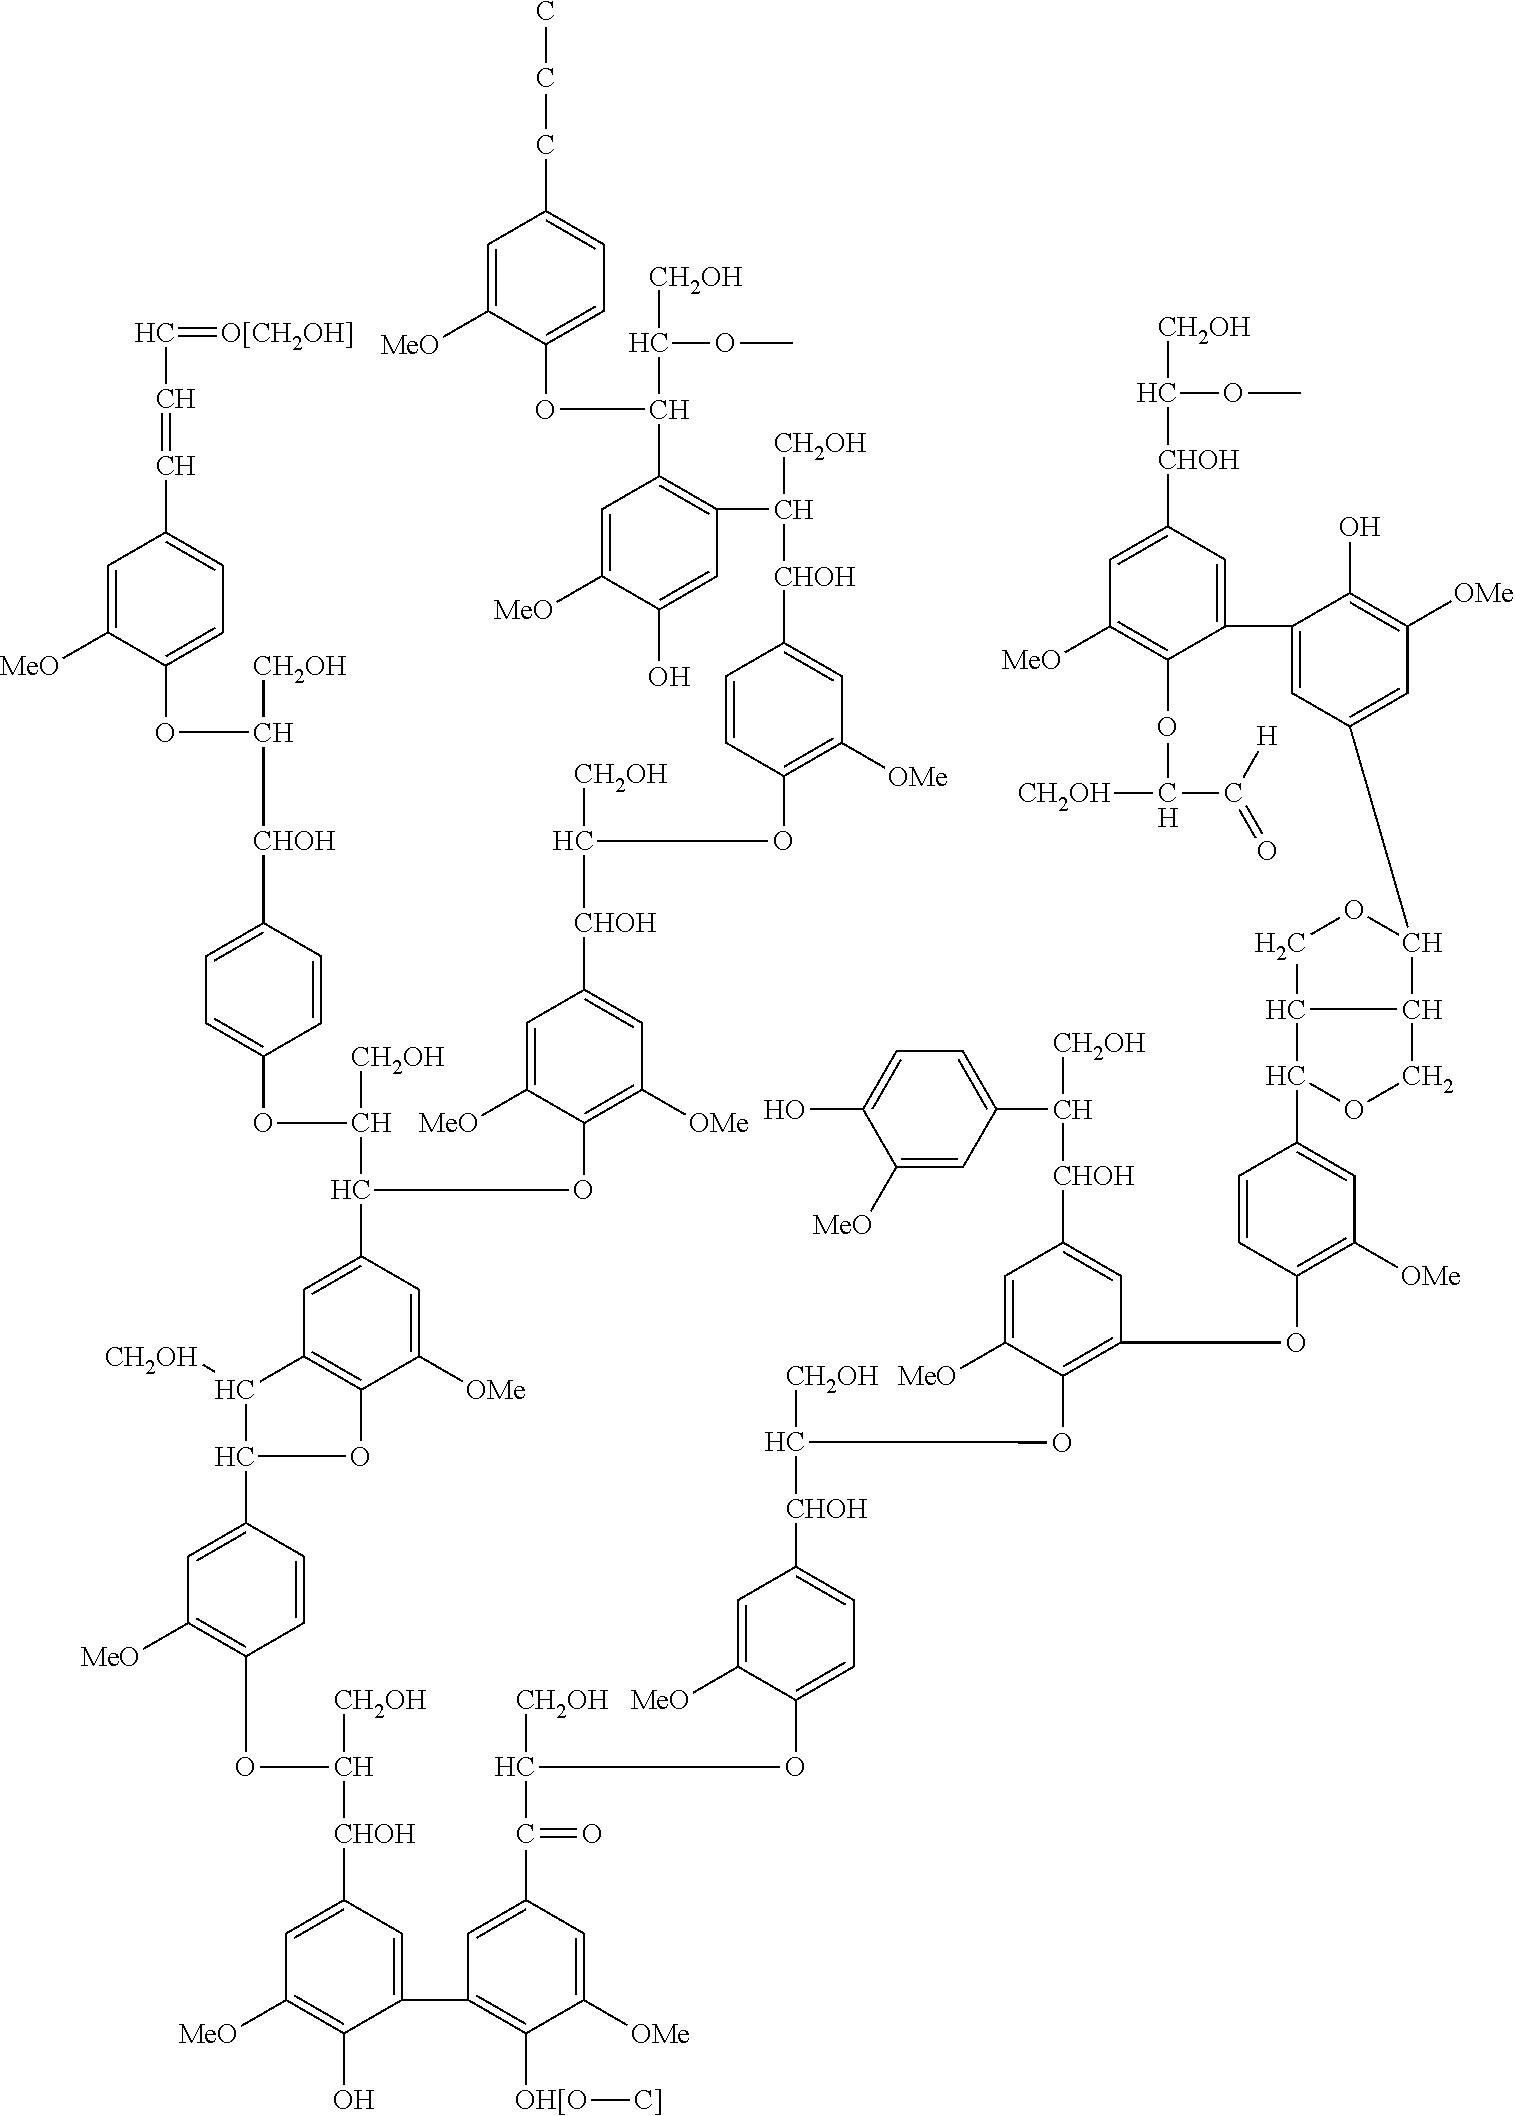 Us8728779b2 Processing Biomass Google Patents Potato Gun Diagram Figure Us08728779 20140520 C00003